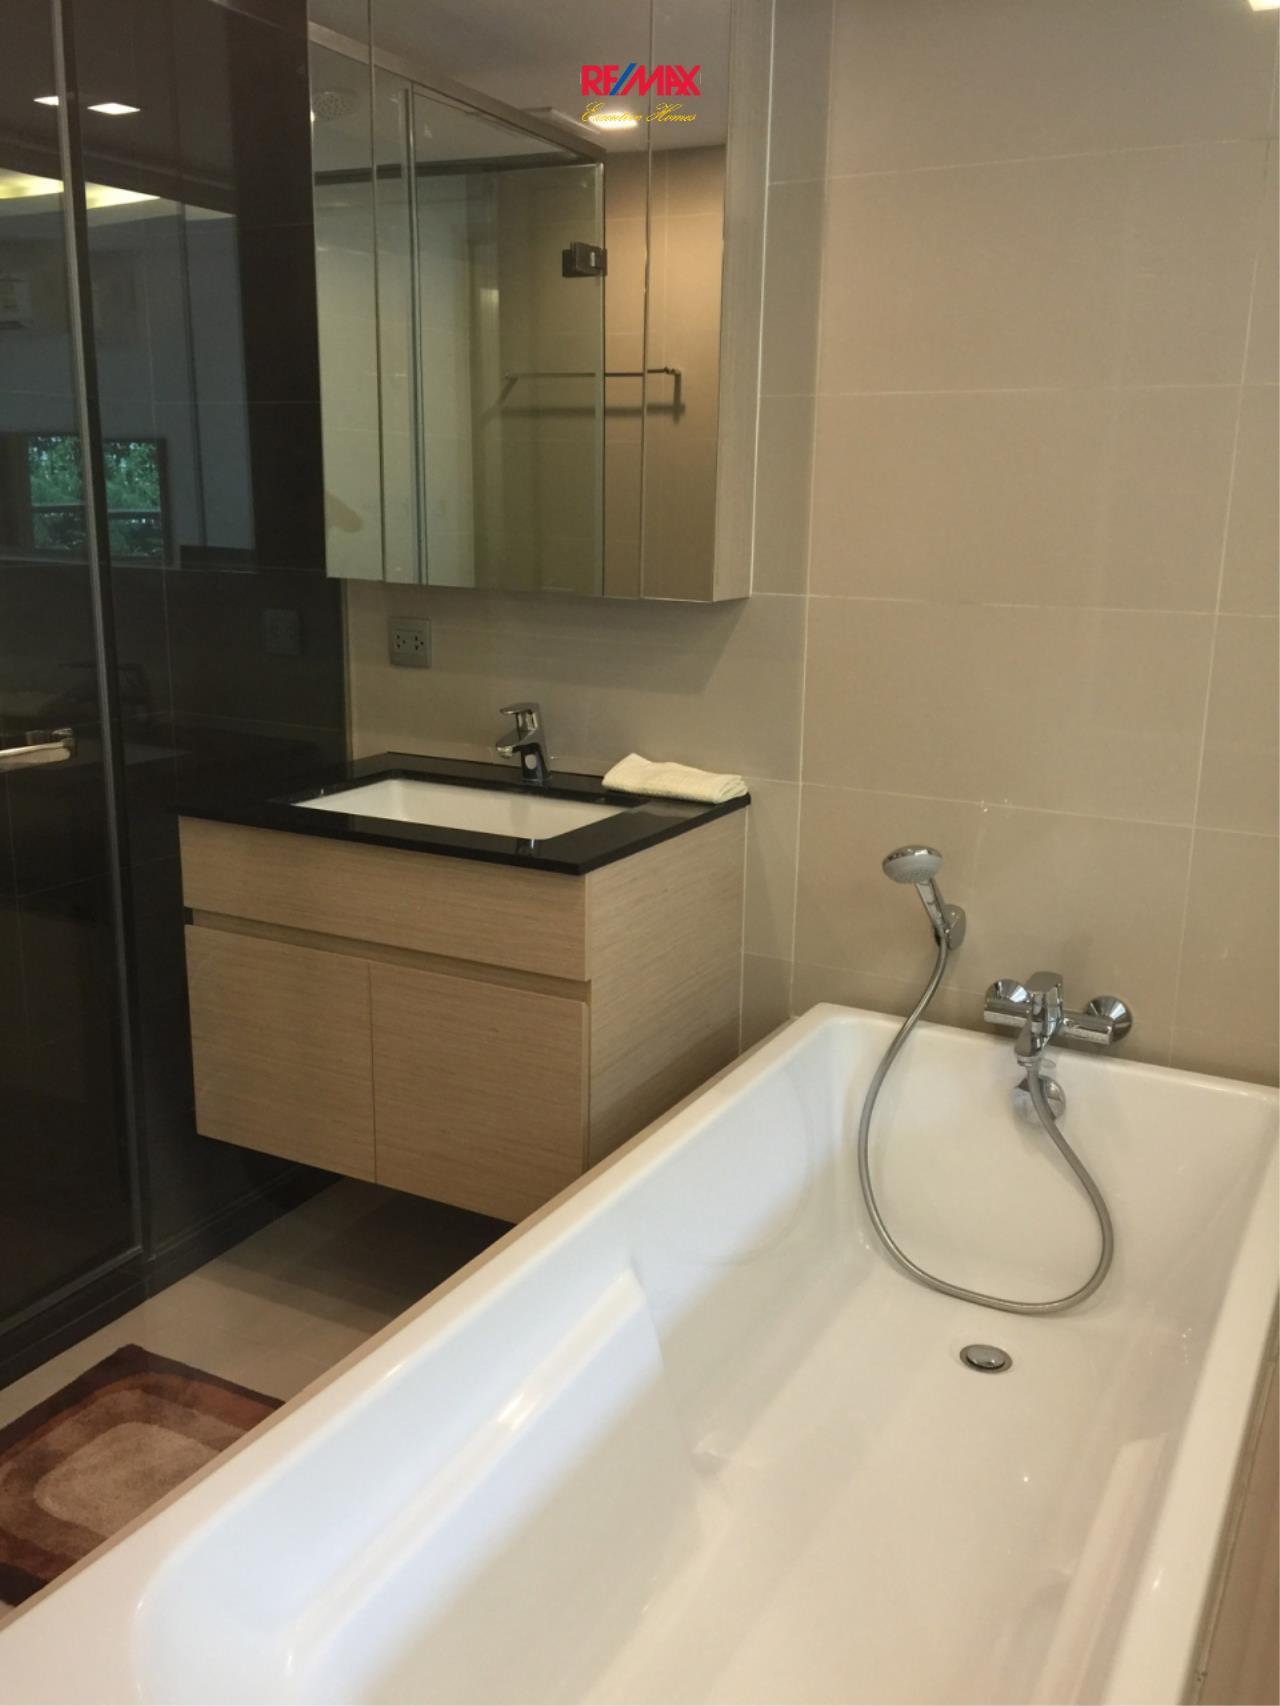 RE/MAX Executive Homes Agency's NICE 1 BEDROOM FOR RENT VIA BOTANI 6